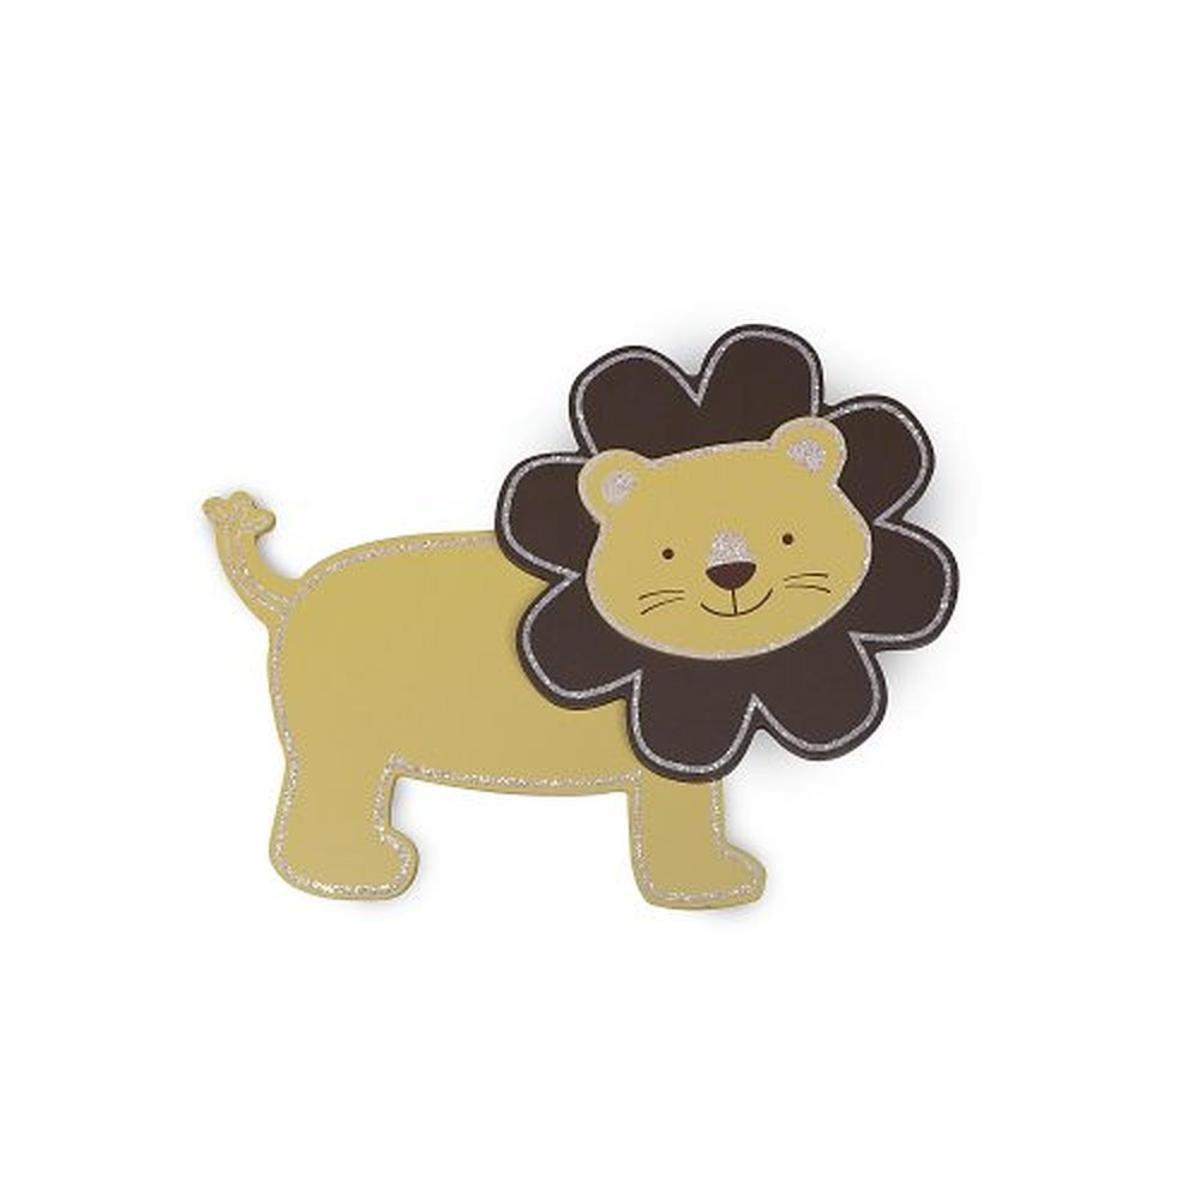 Amazon.com : Koala Baby Wooden Nursery Lion Wall Decor Yellow ...